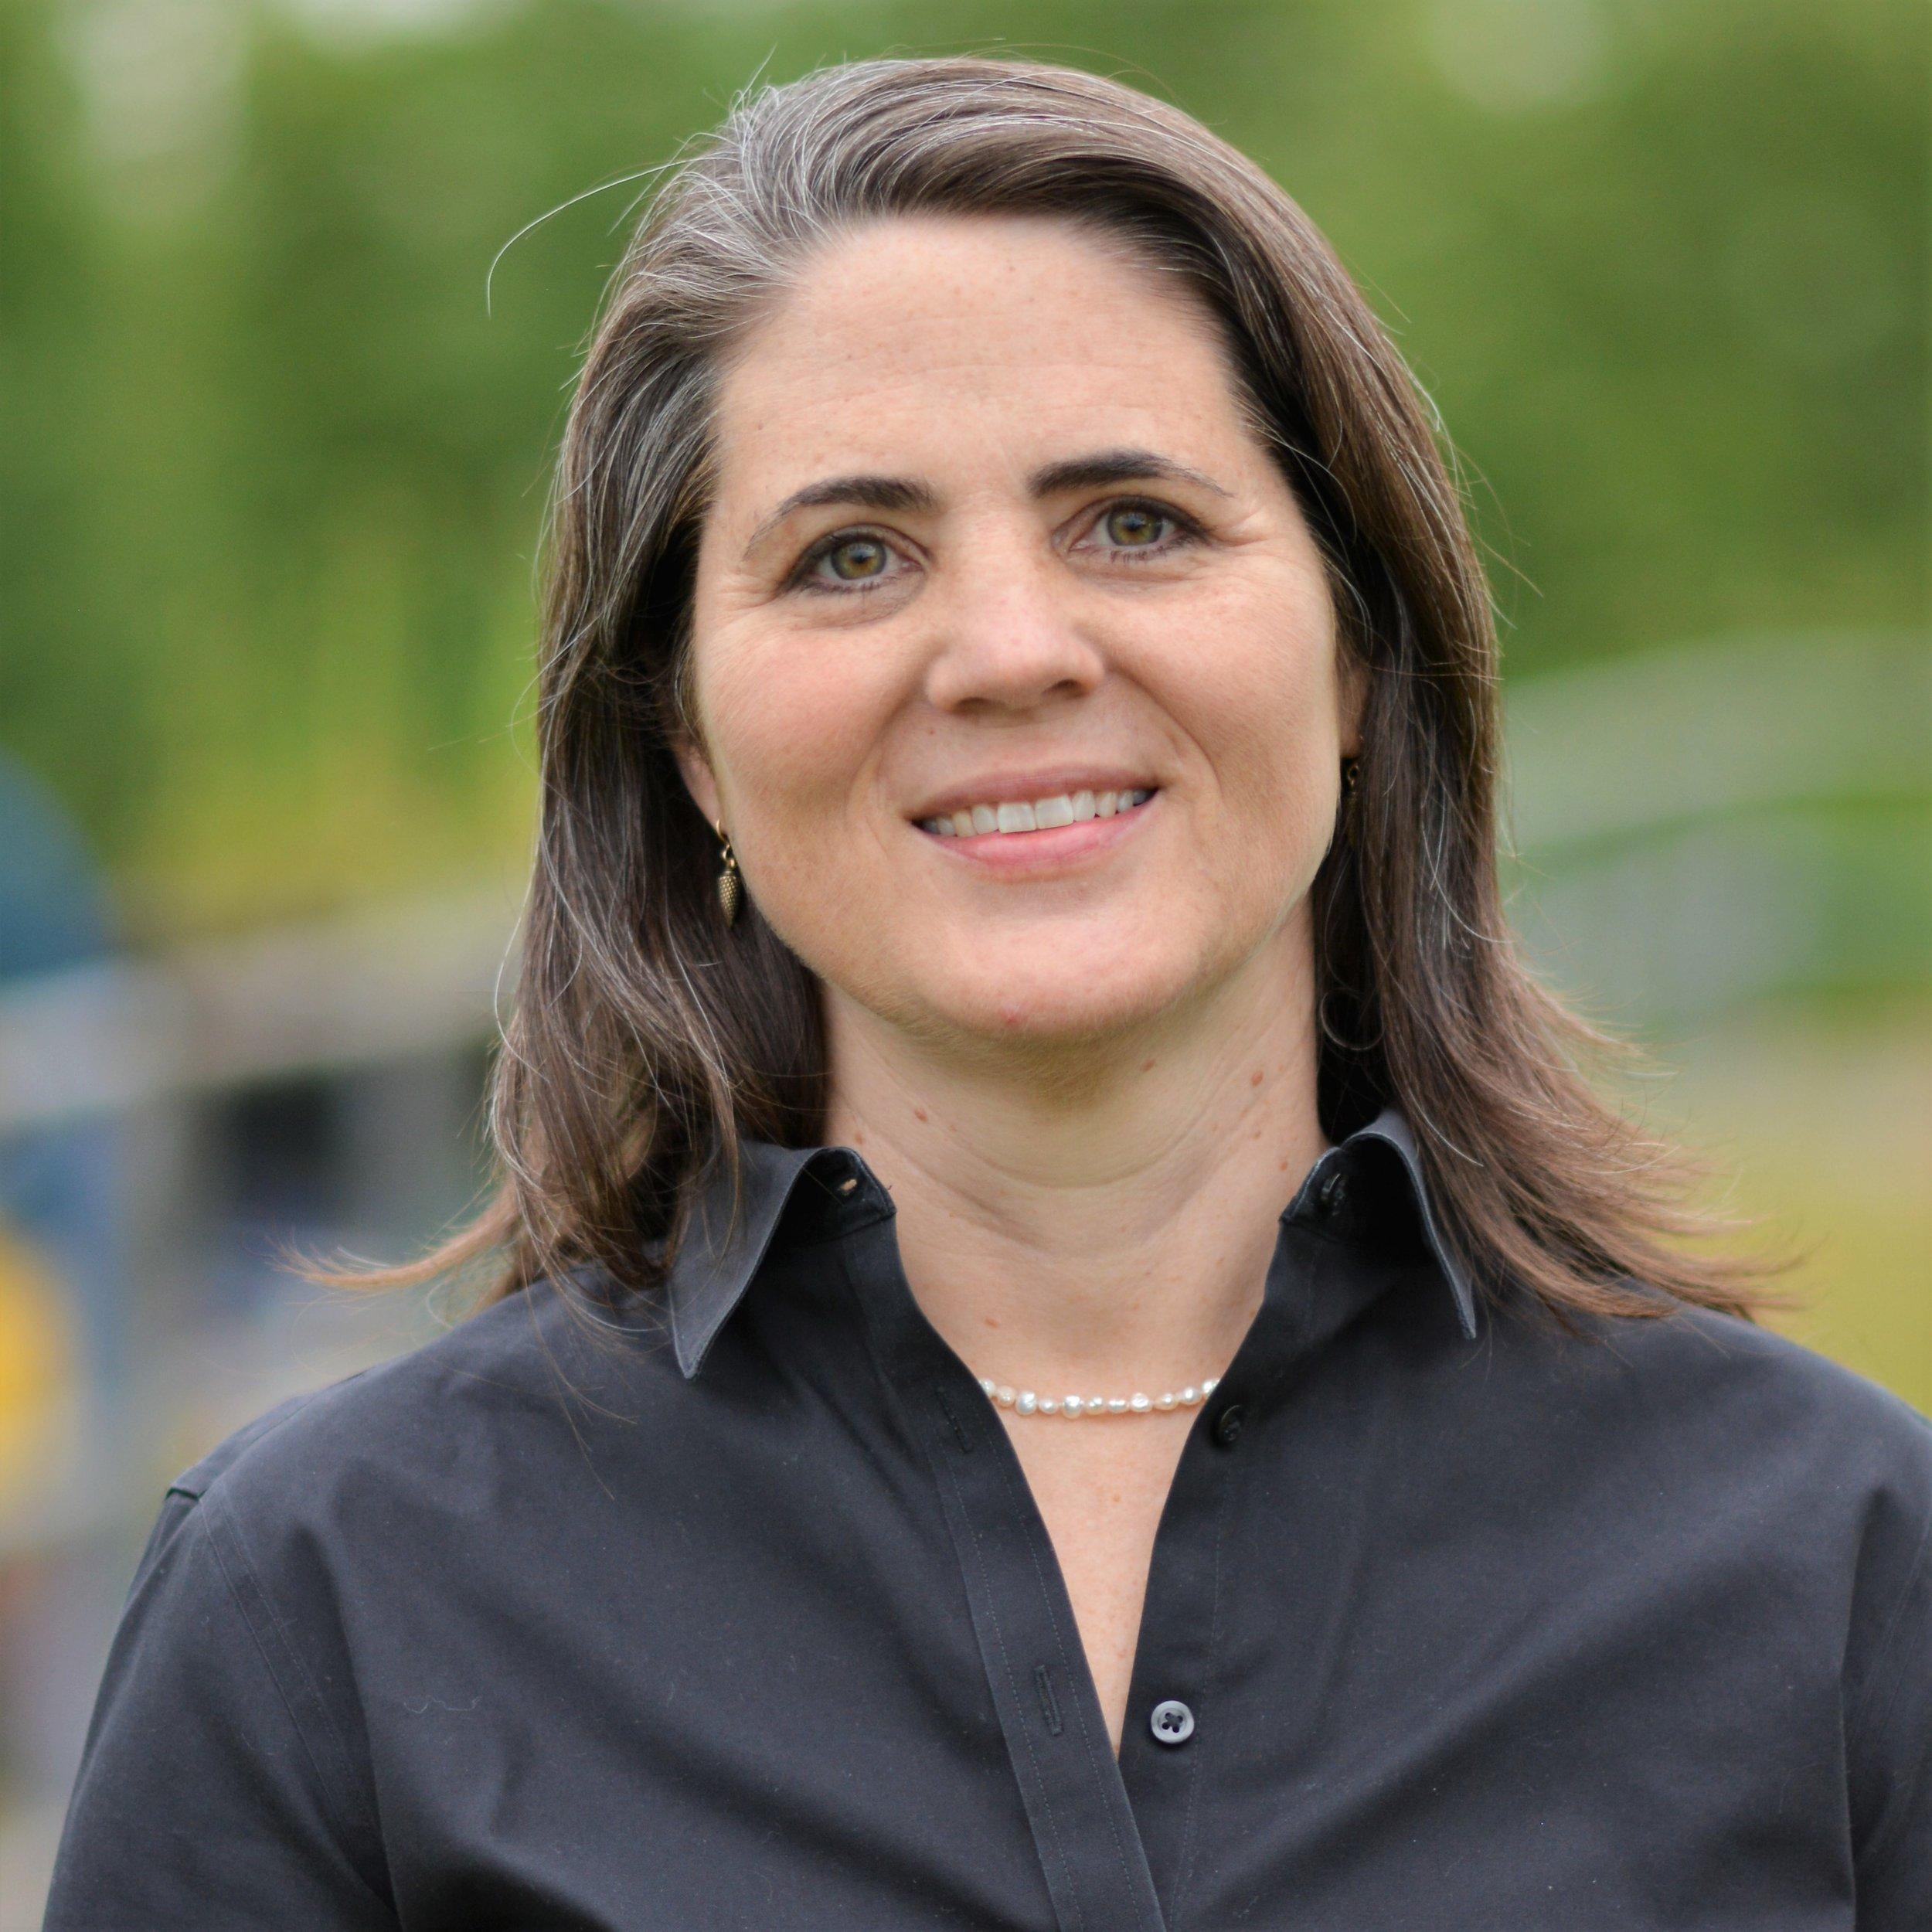 LAURA RACELIS  Project Manager   laura.racelis@christywebber.com